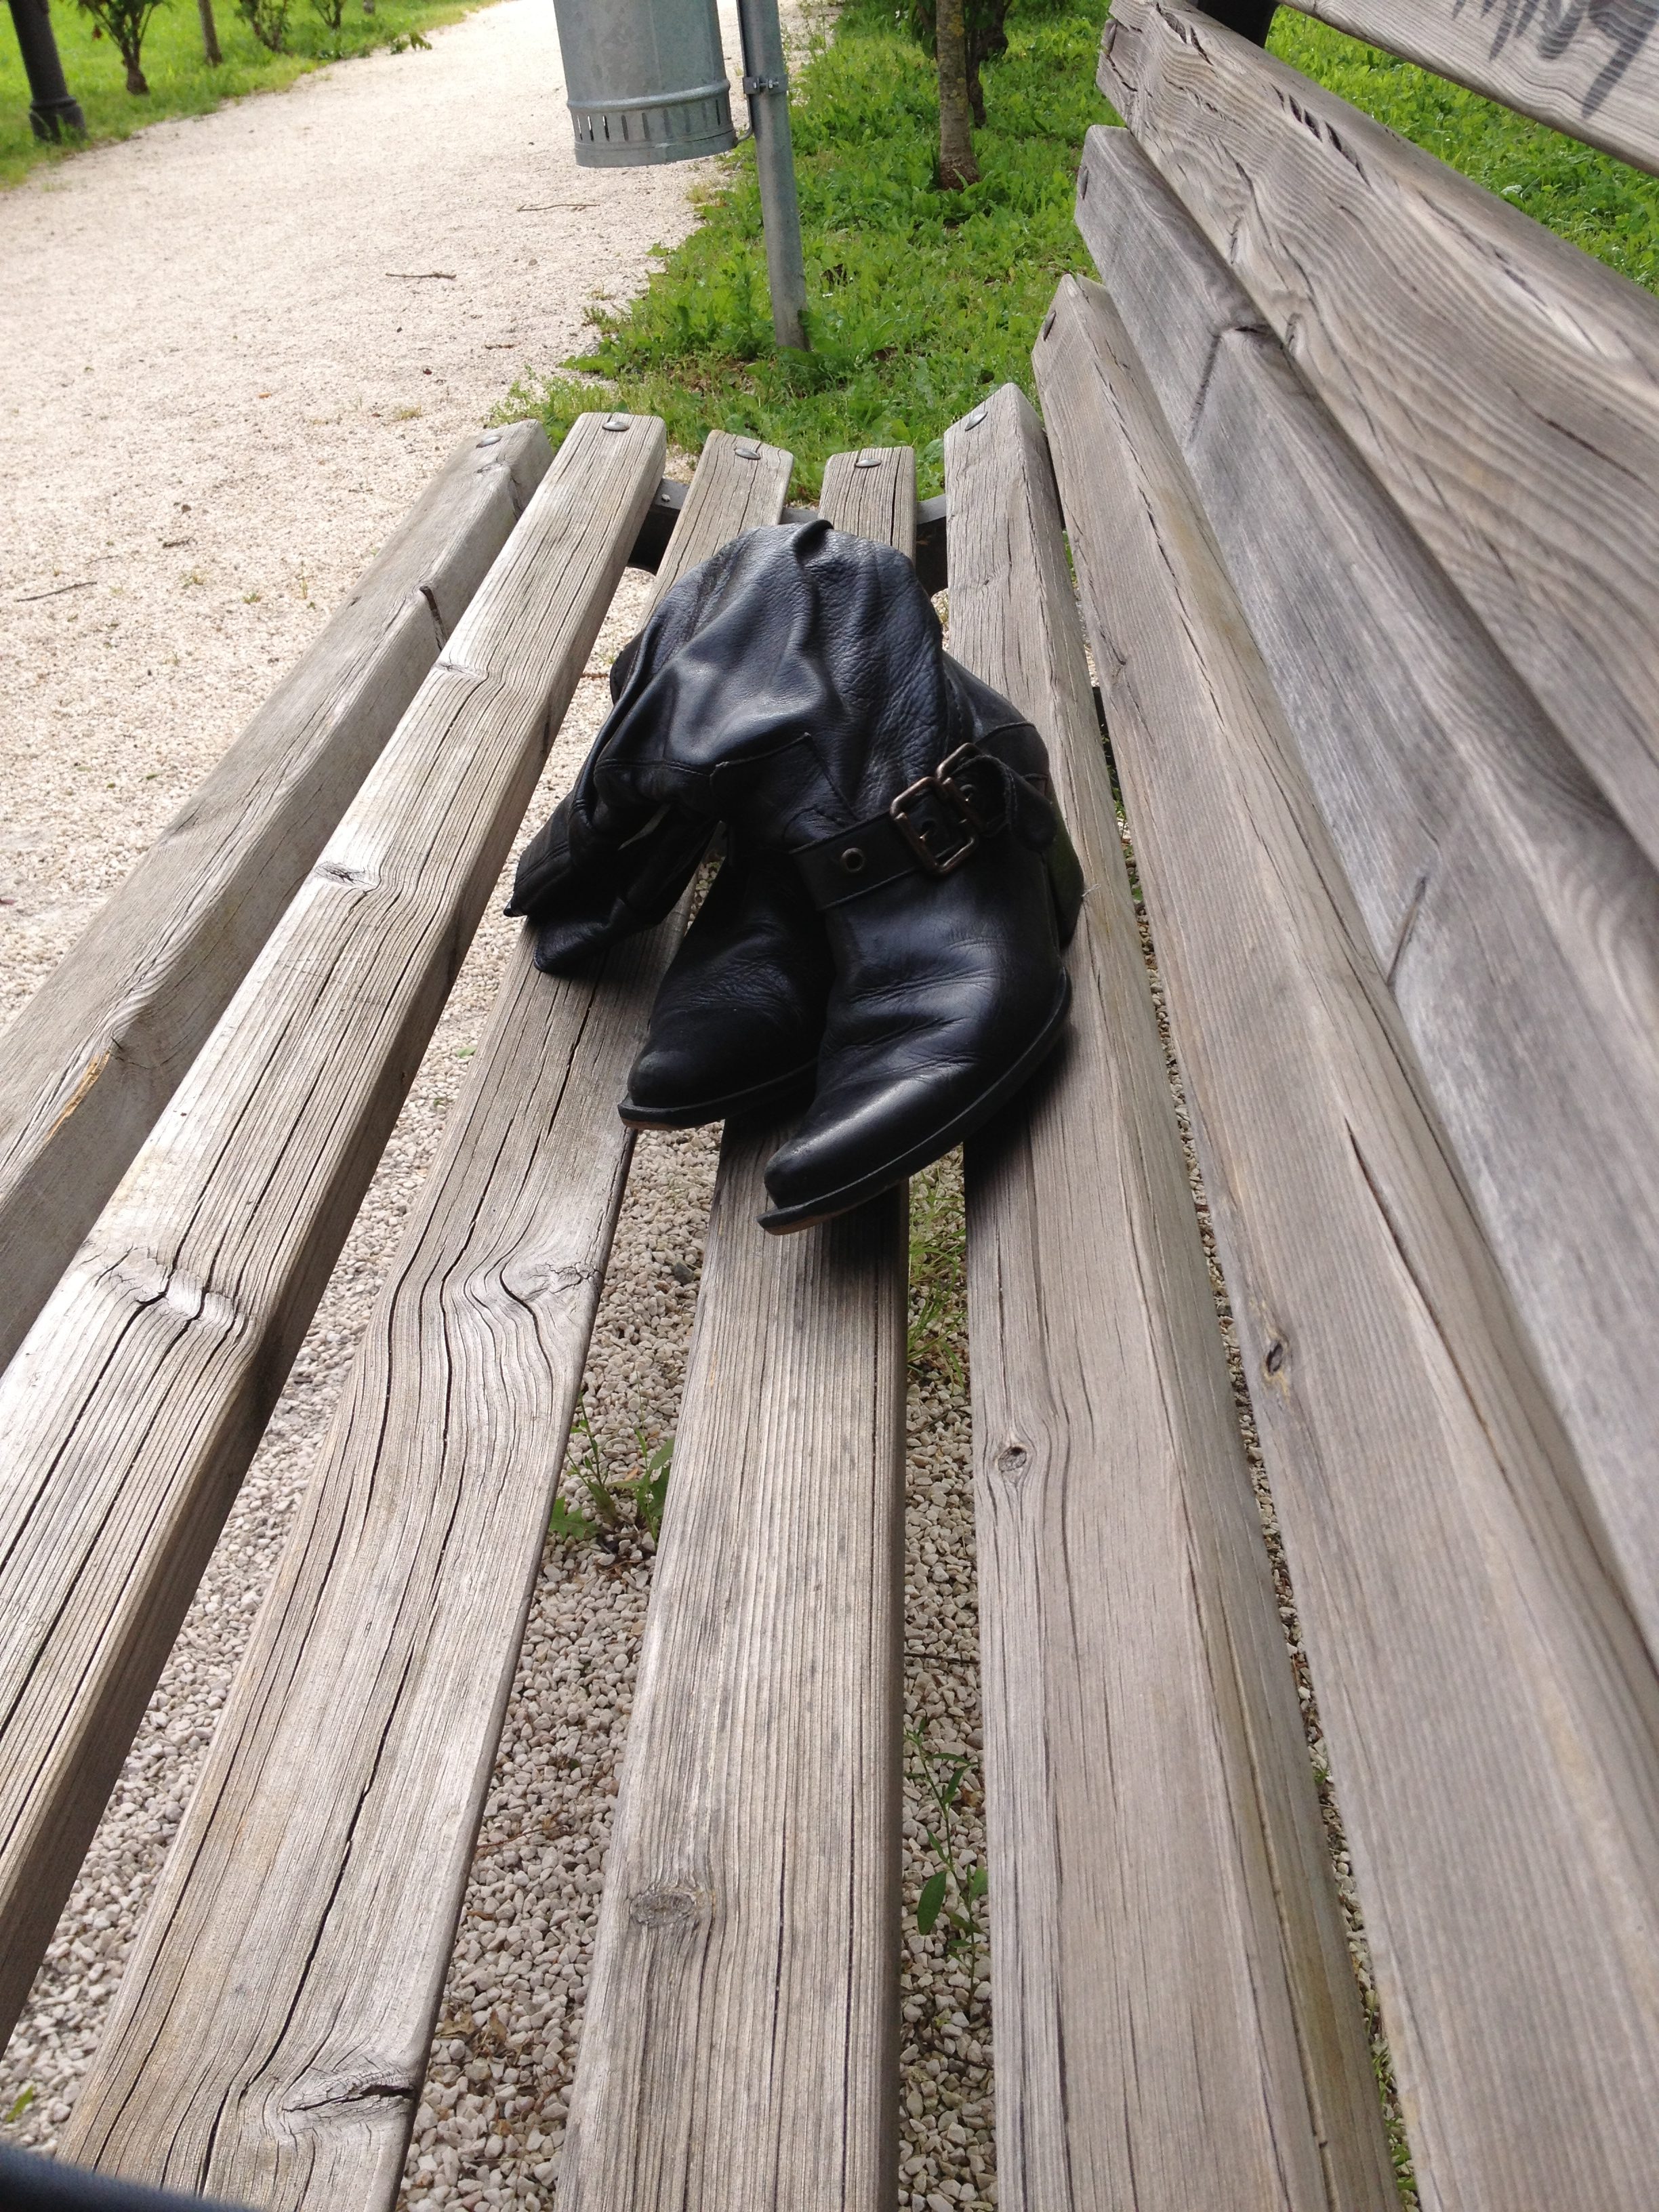 stivali neri abbandonati su una panchina